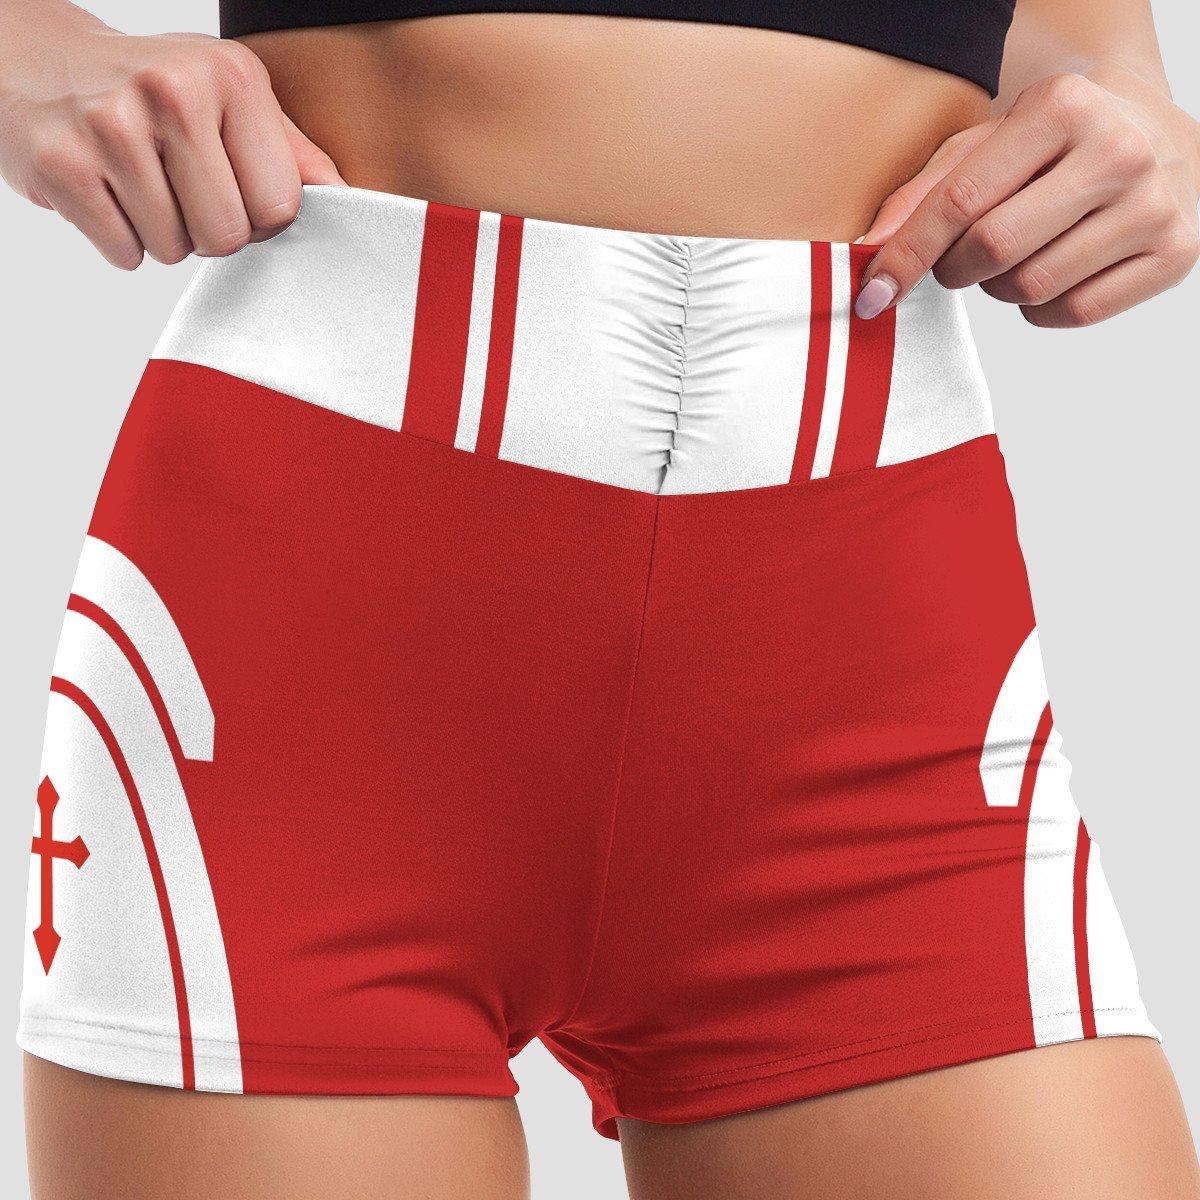 asuna summer active wear set 818309 - Anime Swimsuits